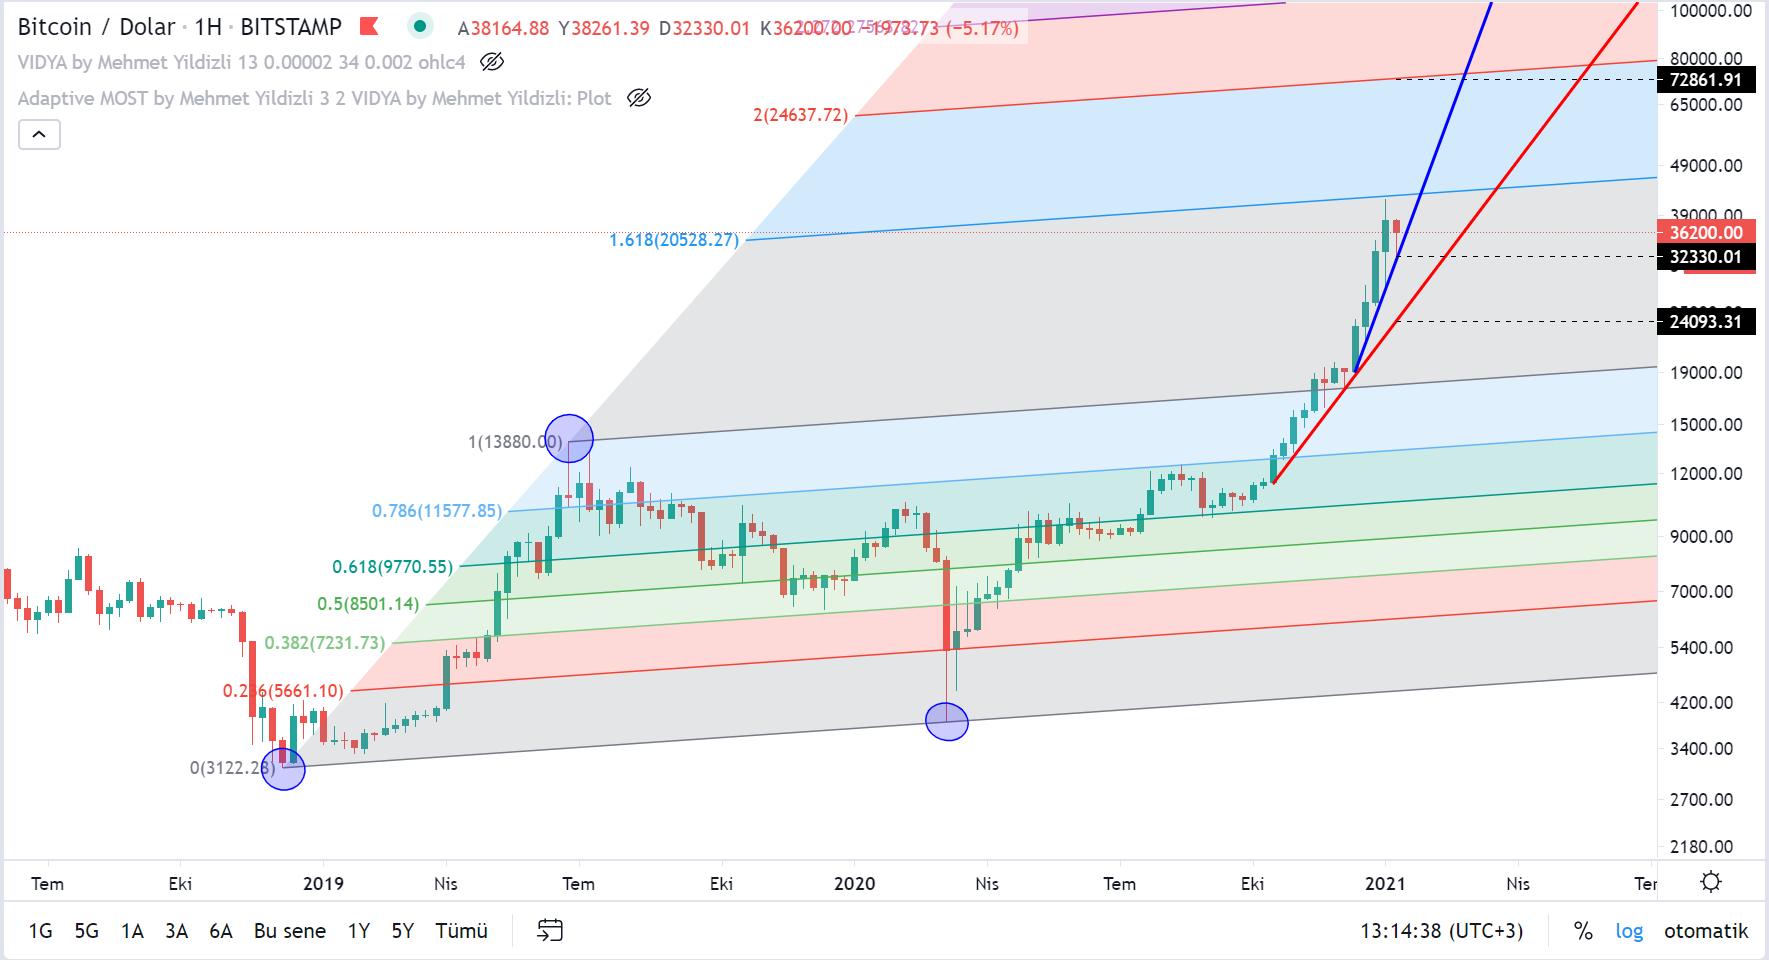 bitcoinin dolar bazinda teknik analizi 11 ocak 2021 1